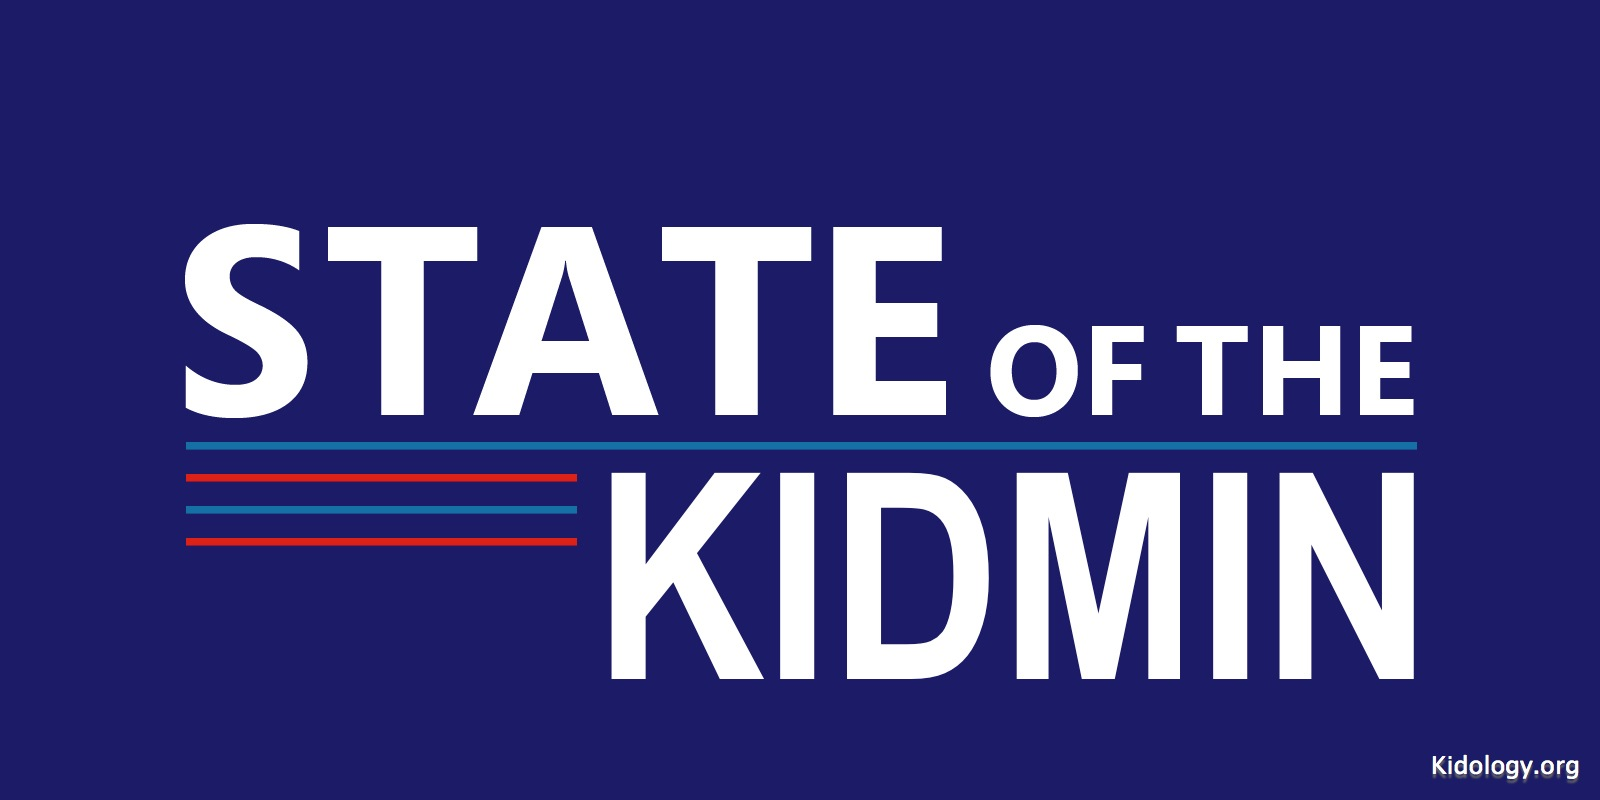 stateofthekidmin-kdb